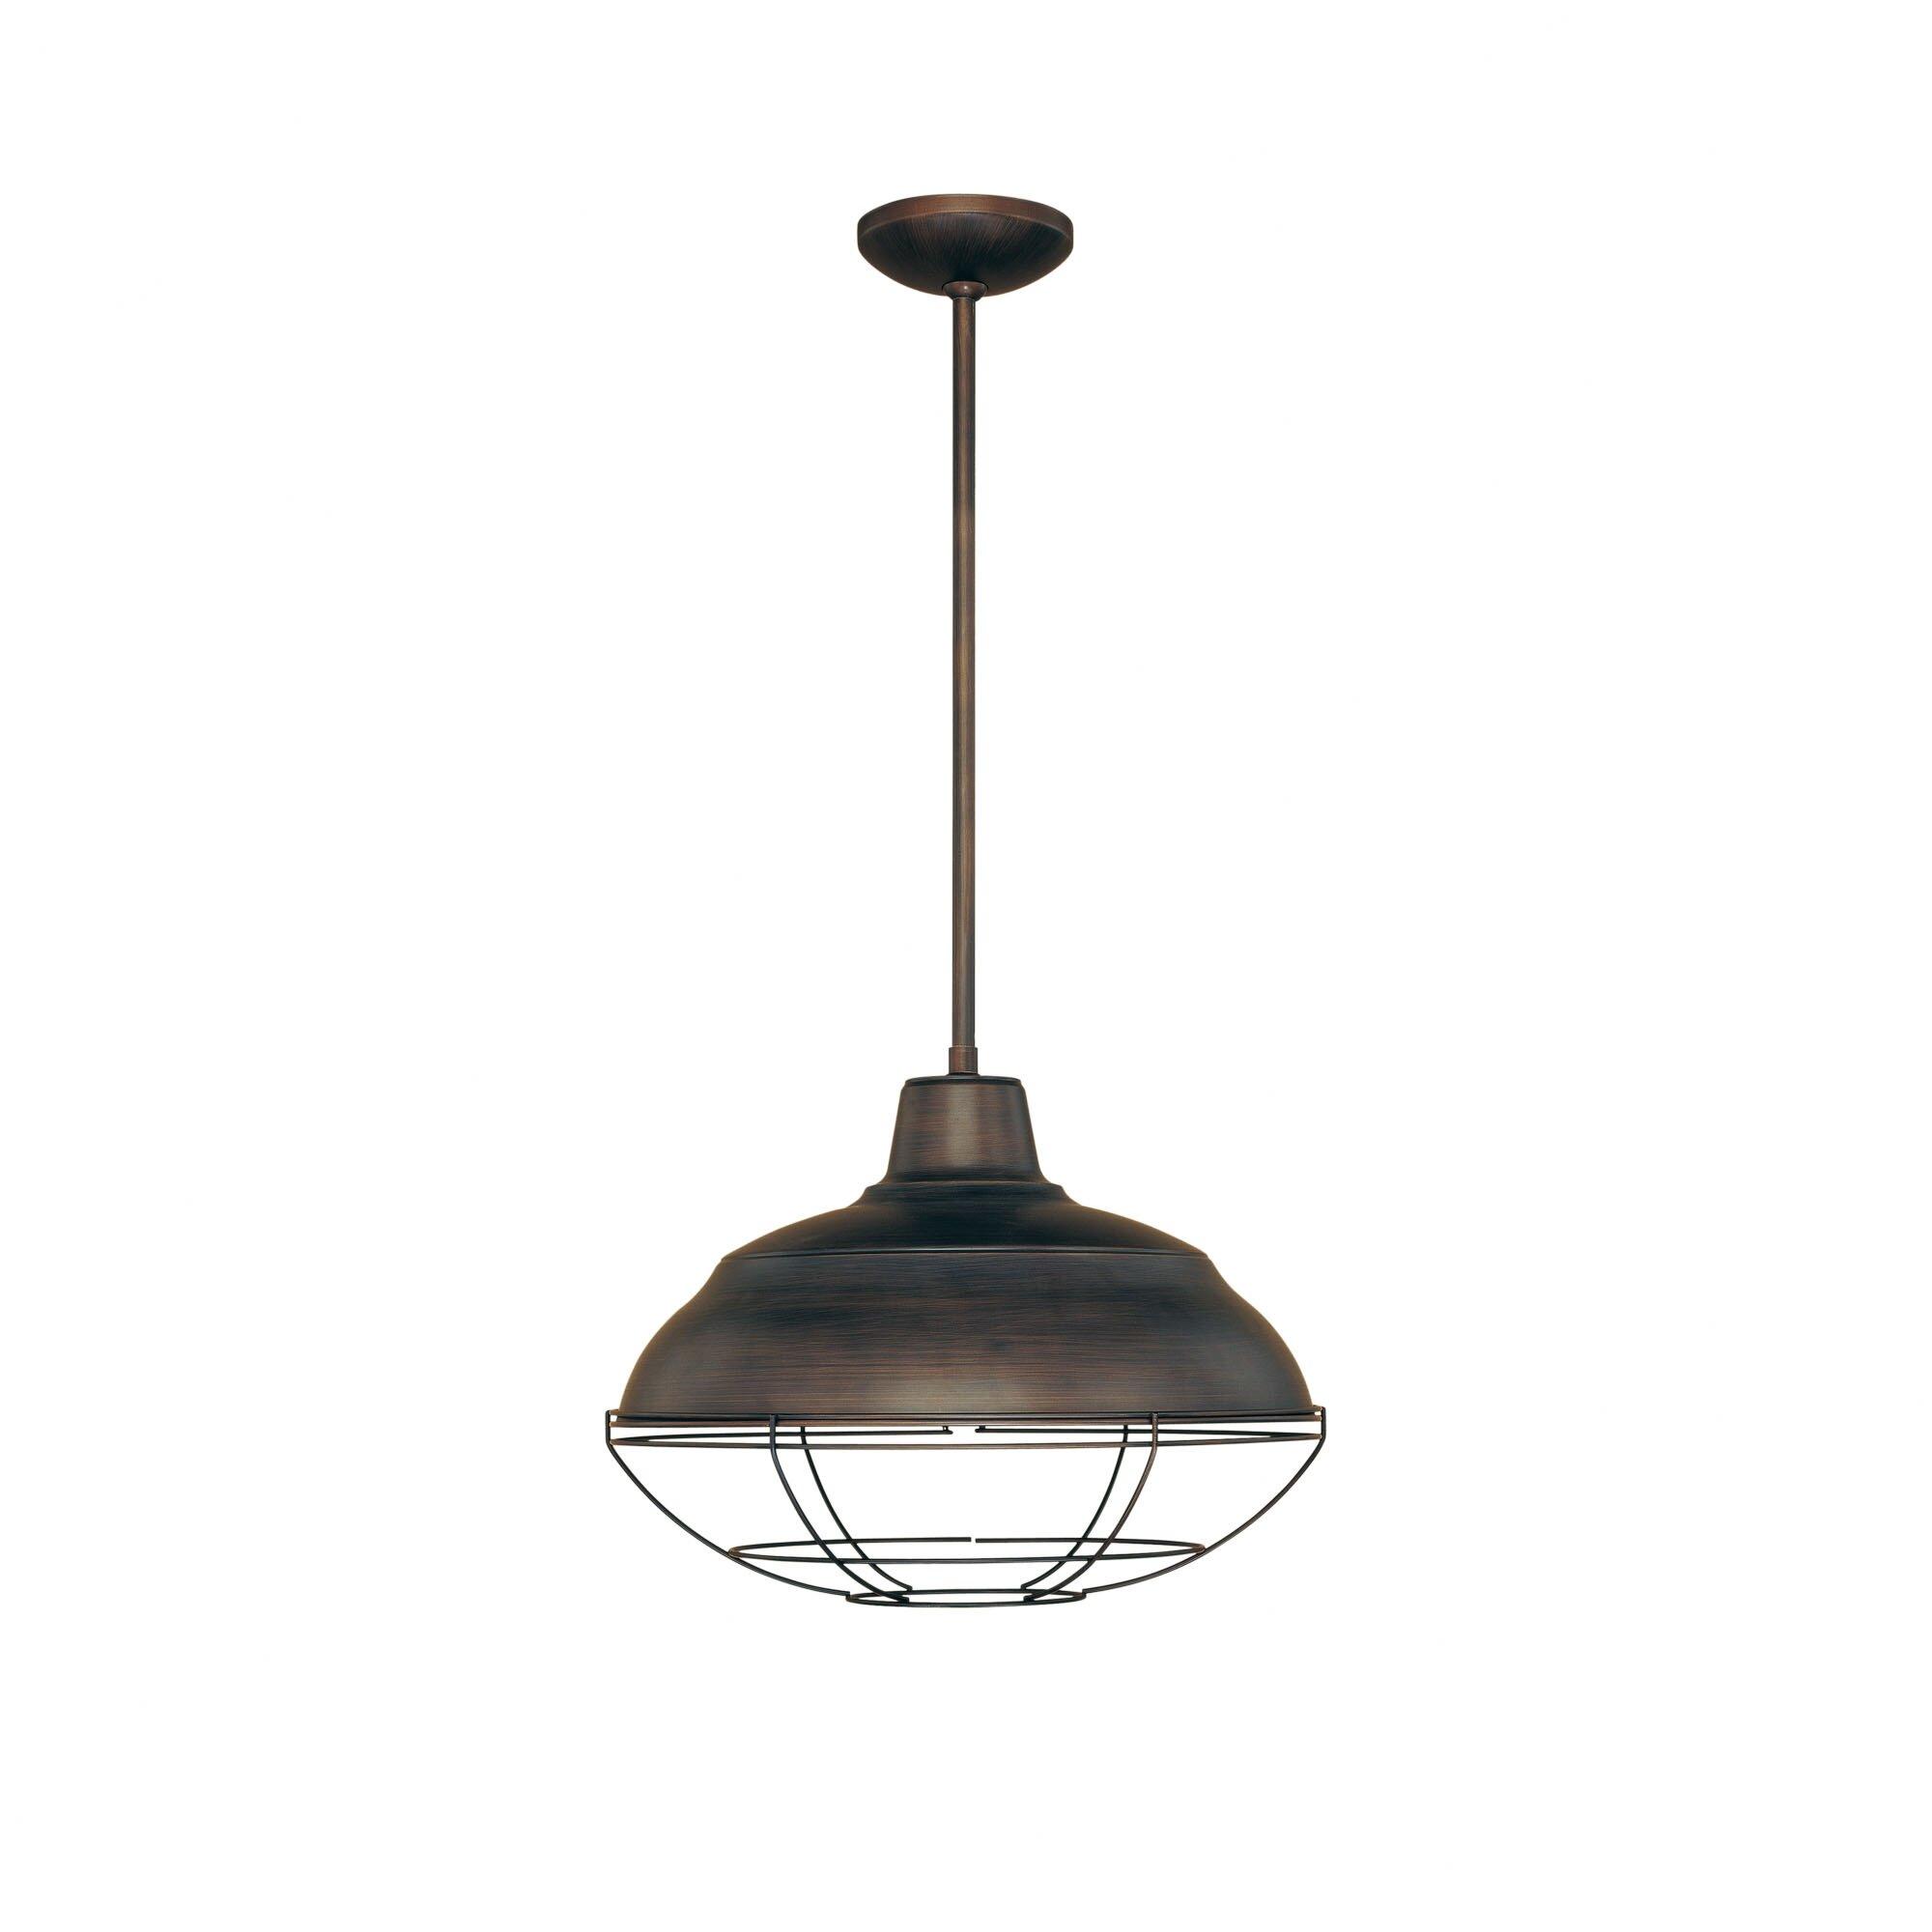 millennium lighting neo industrial 1 light pendant reviews wayfair. Black Bedroom Furniture Sets. Home Design Ideas